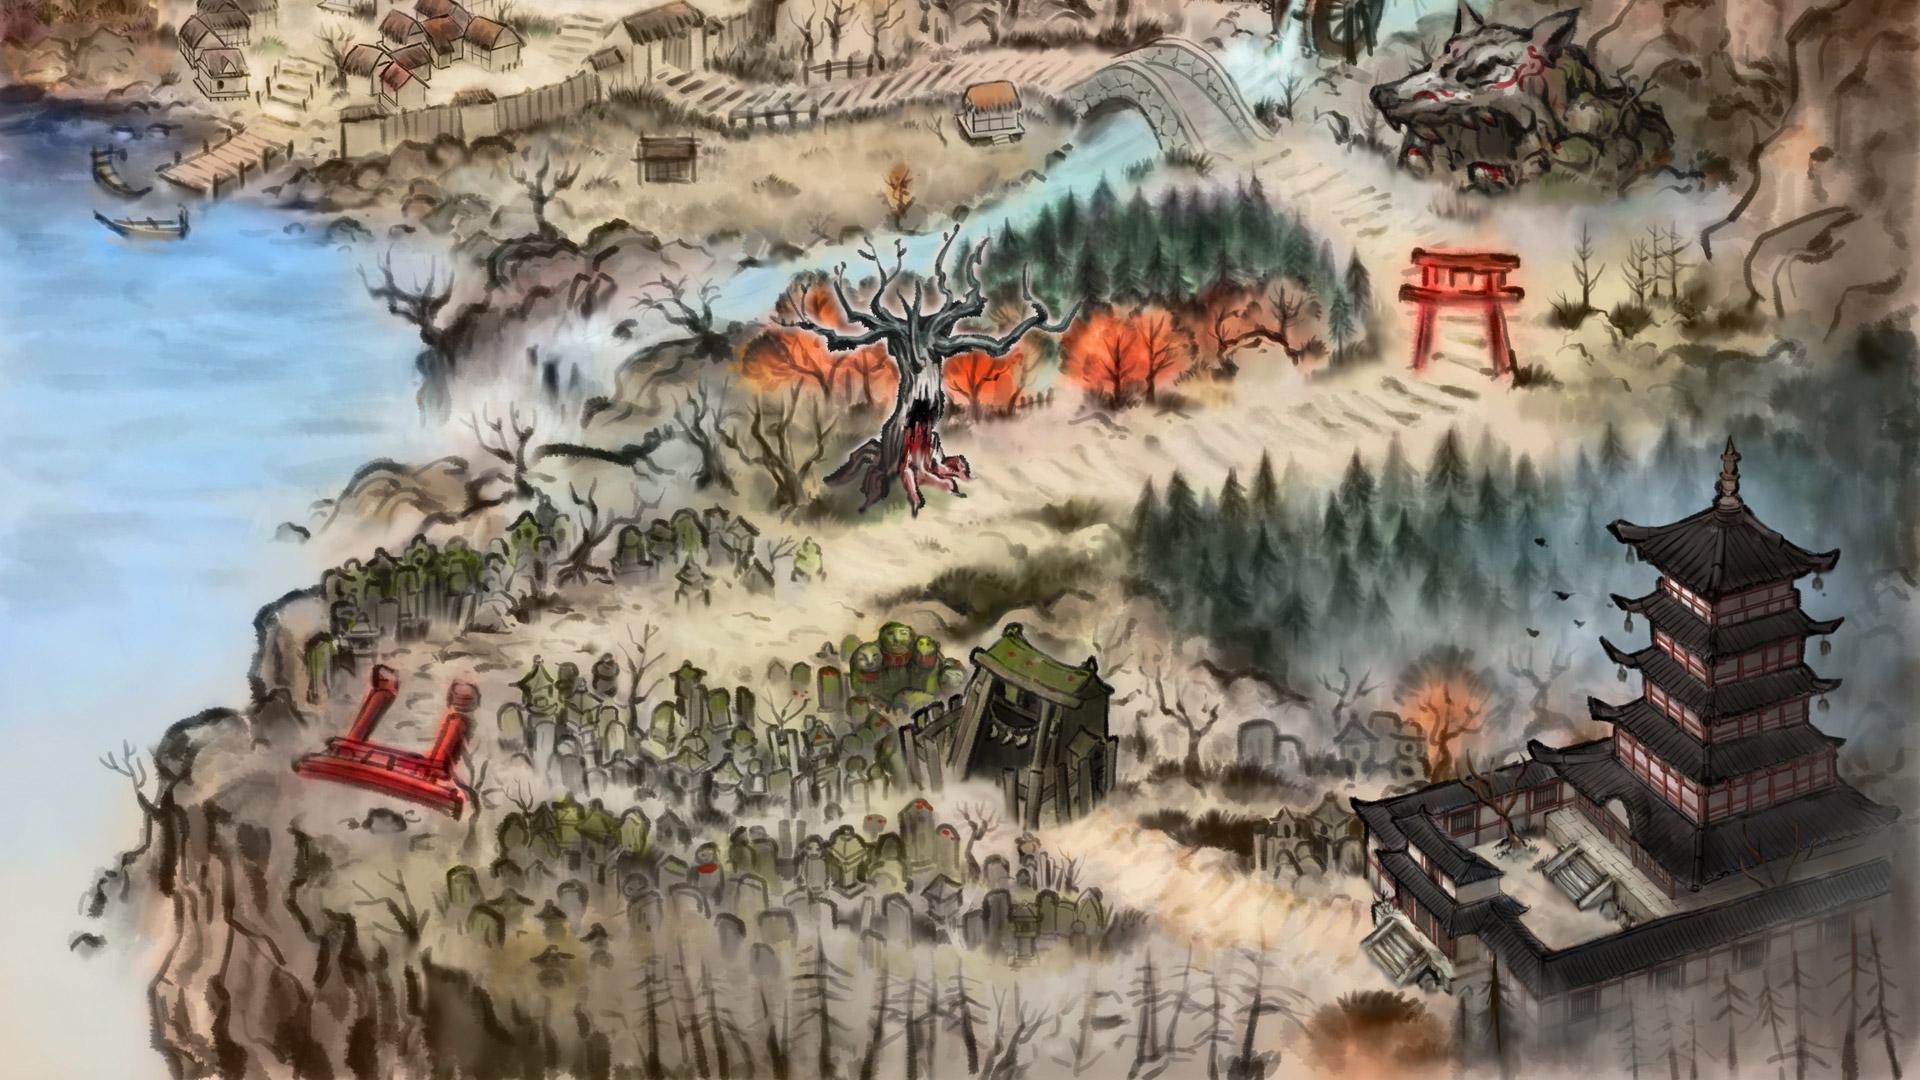 Free Akaneiro: Demon Hunters Wallpaper in 1920x1080